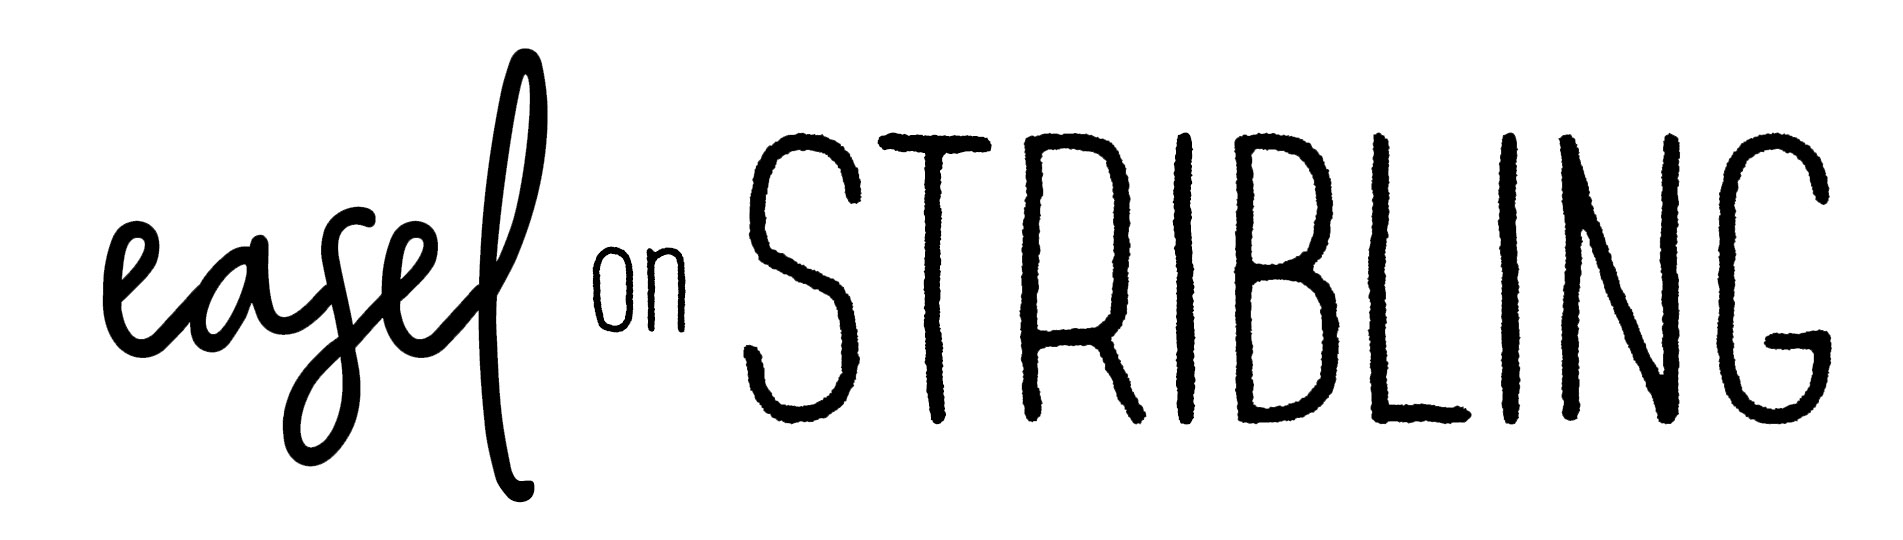 logolongblack.jpg